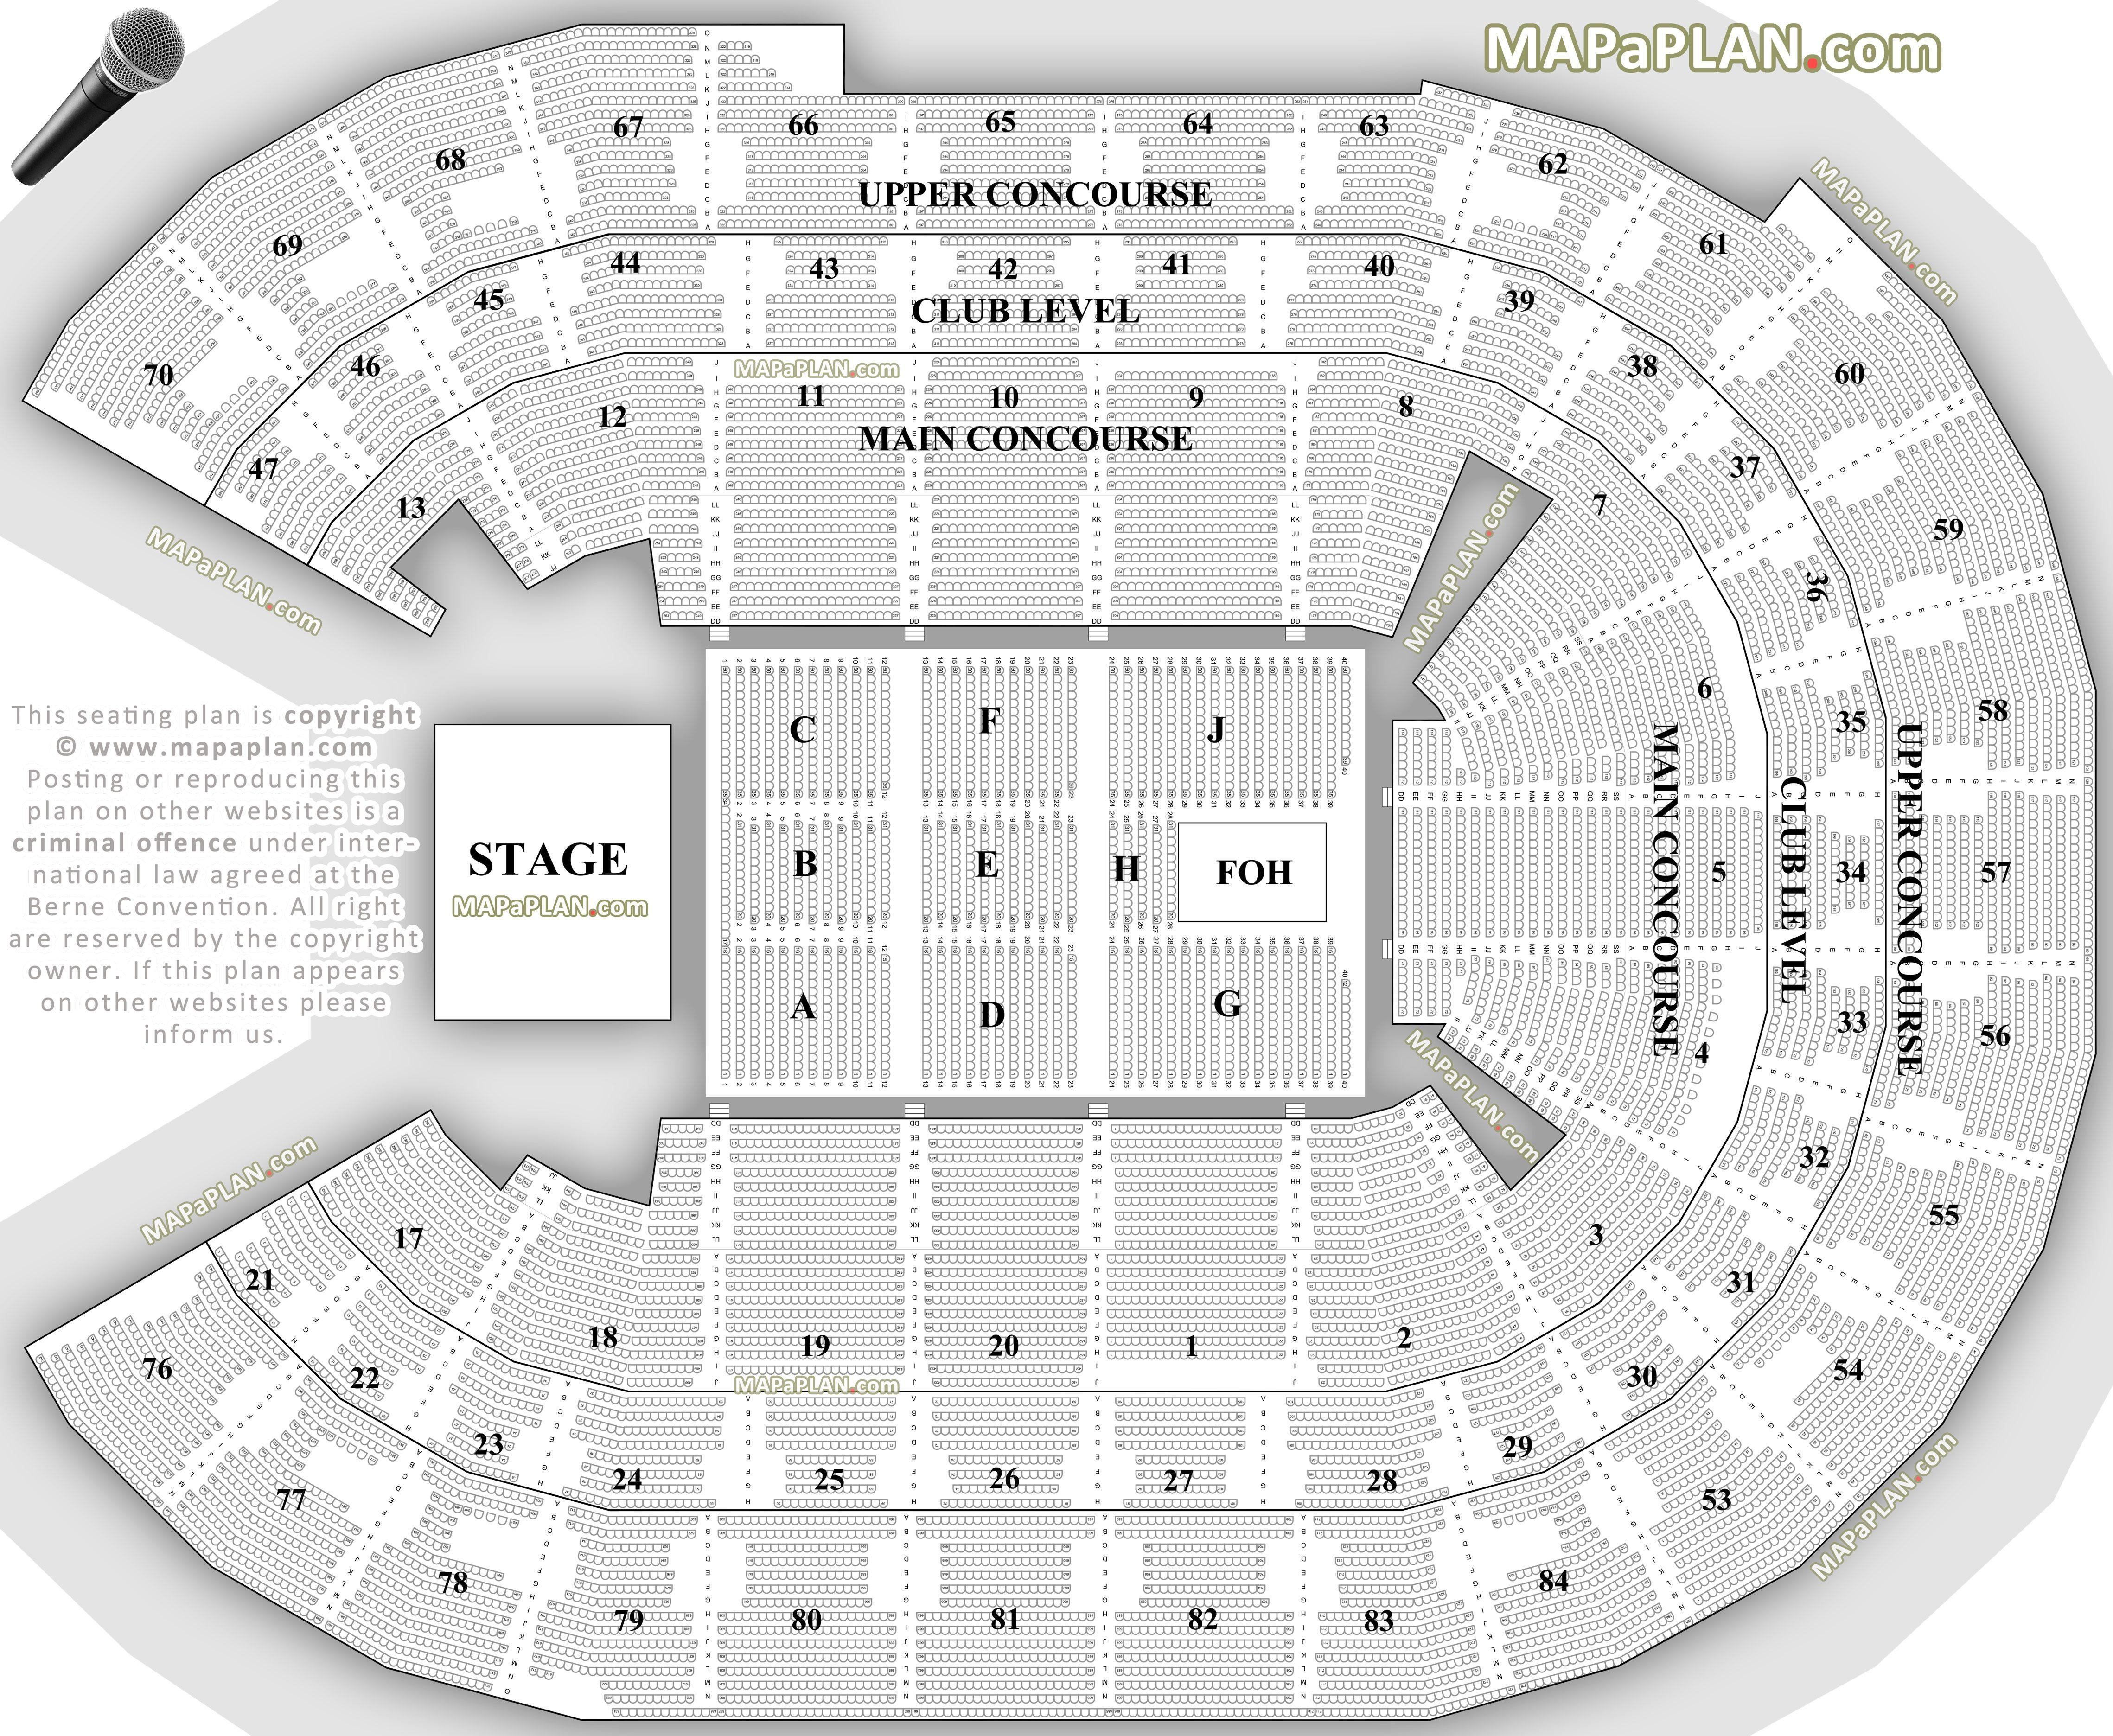 Rogers Arena Floor Seating Plan Sydney Allphones Arena Detailed Seat Numebers Amp Row